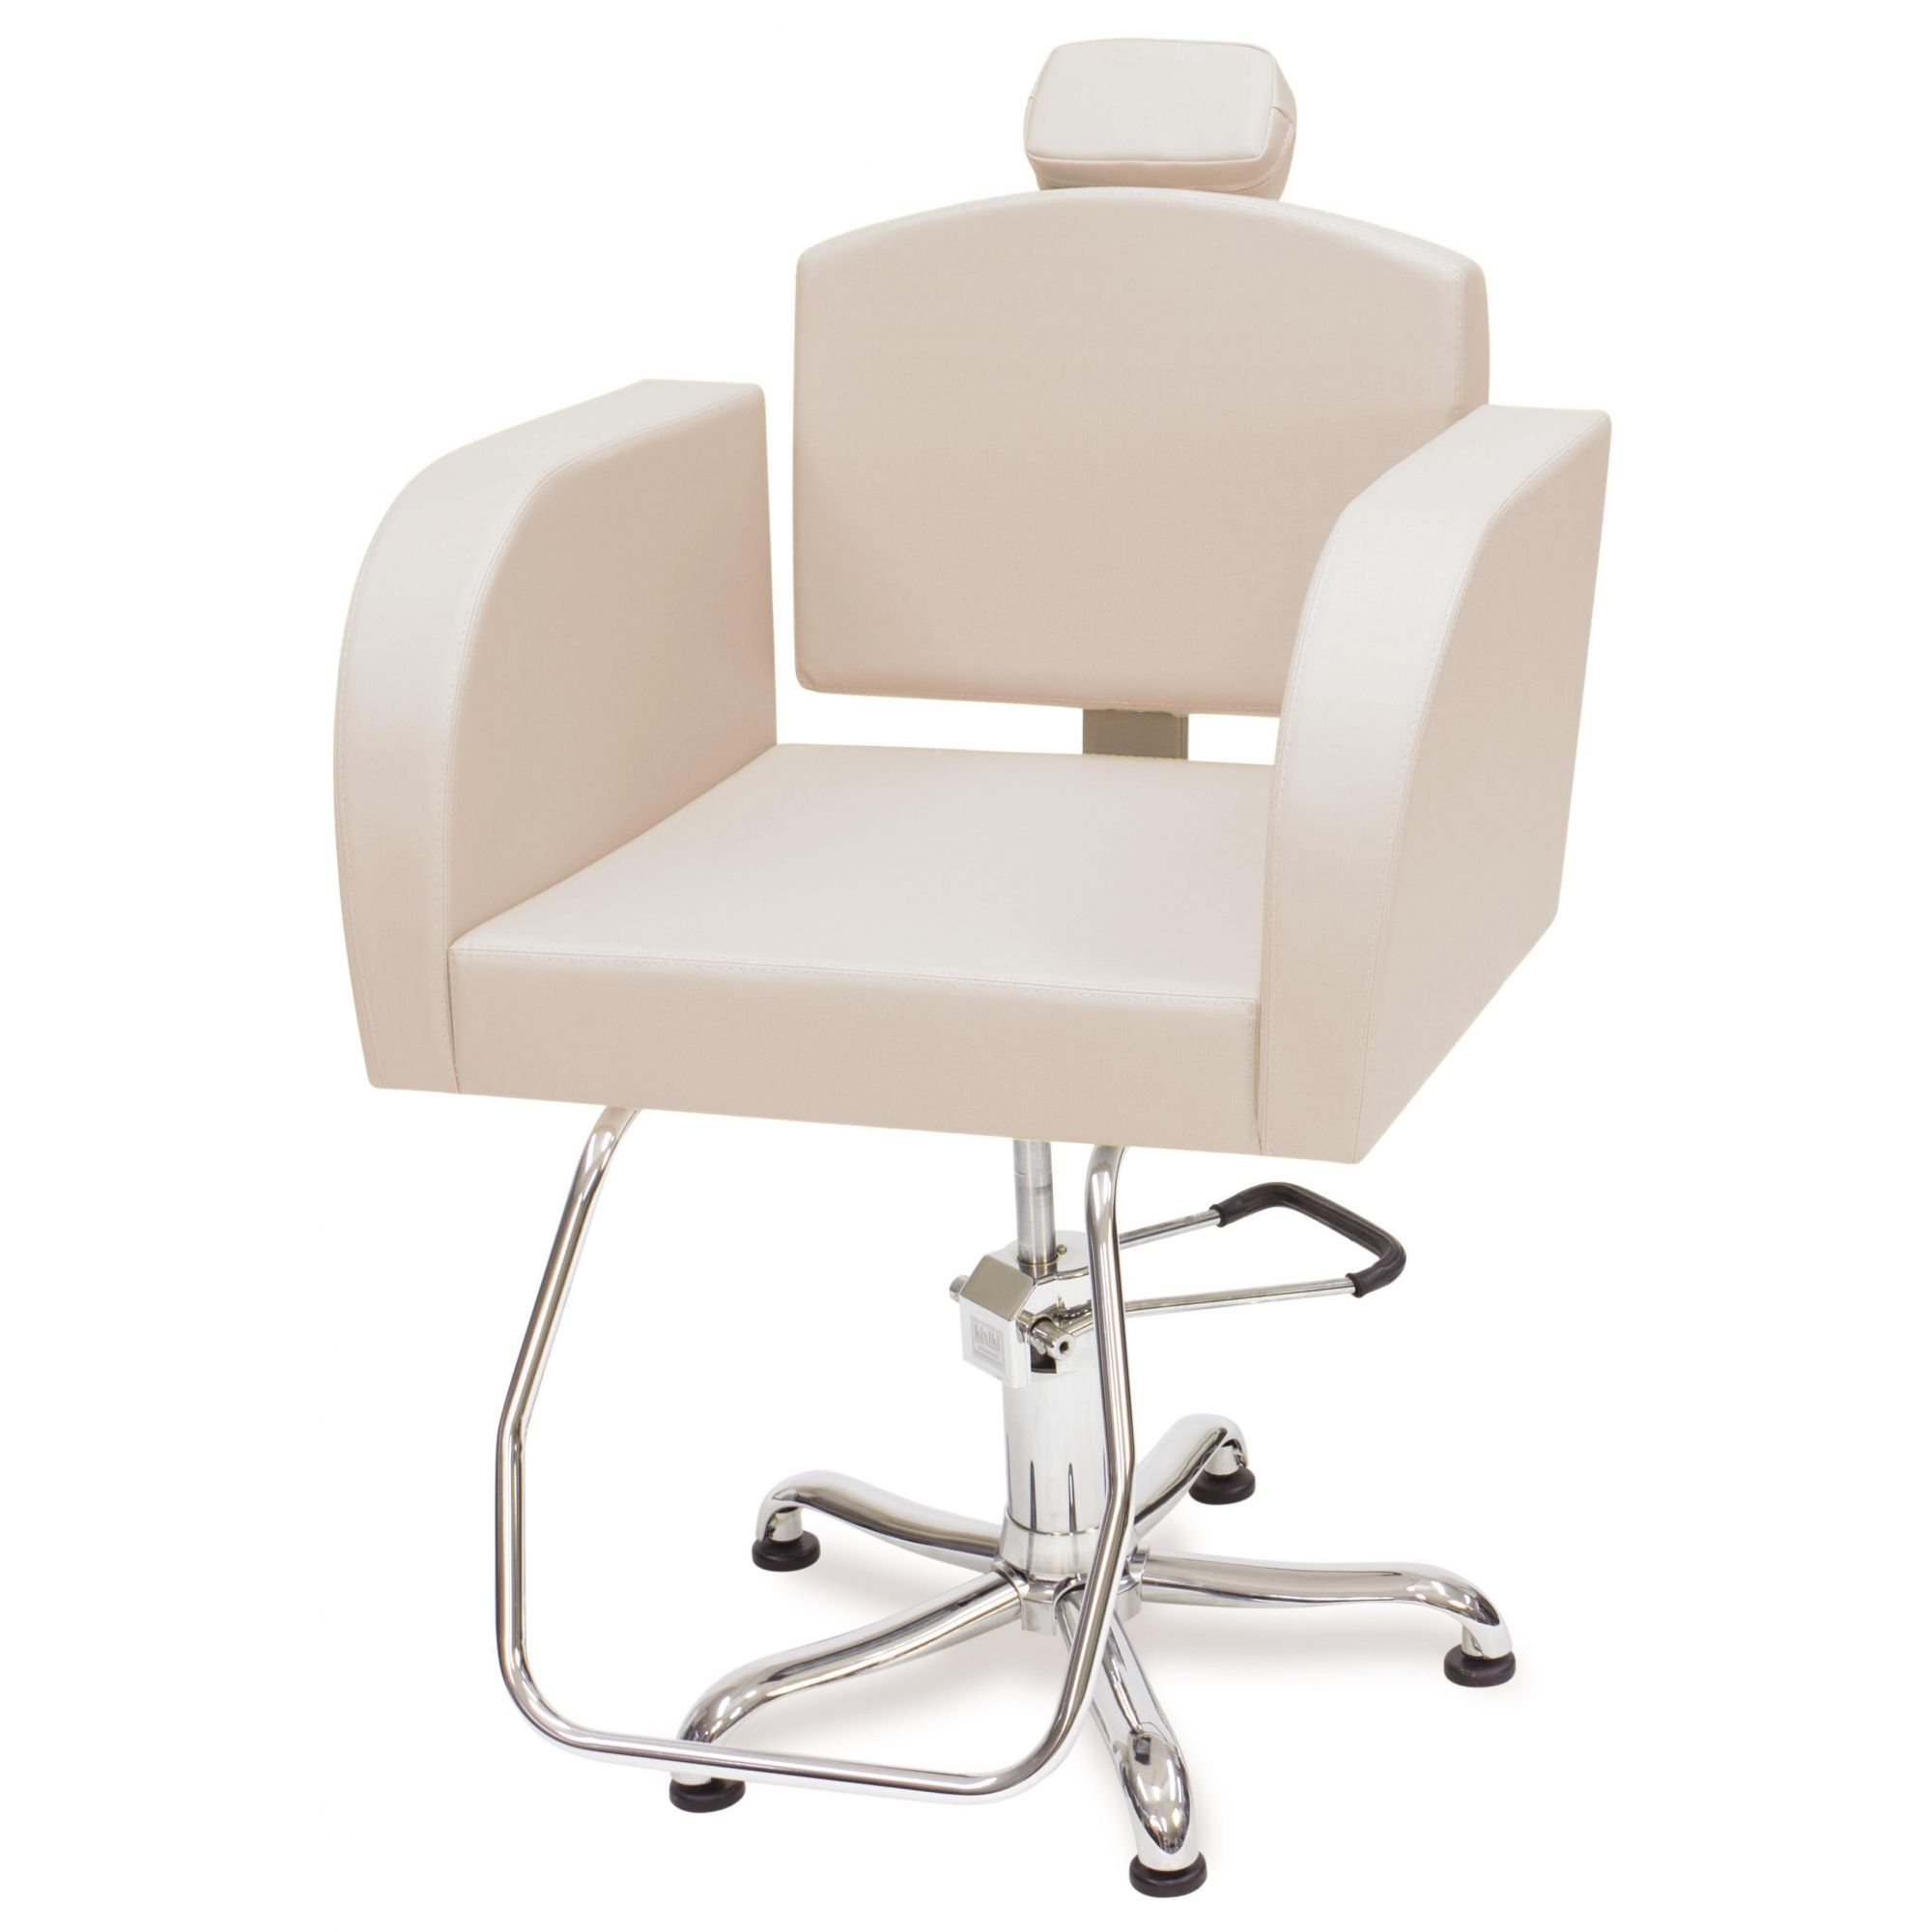 Poltrona Cadeira Kixiki Reclínavel - Capri Para Salão